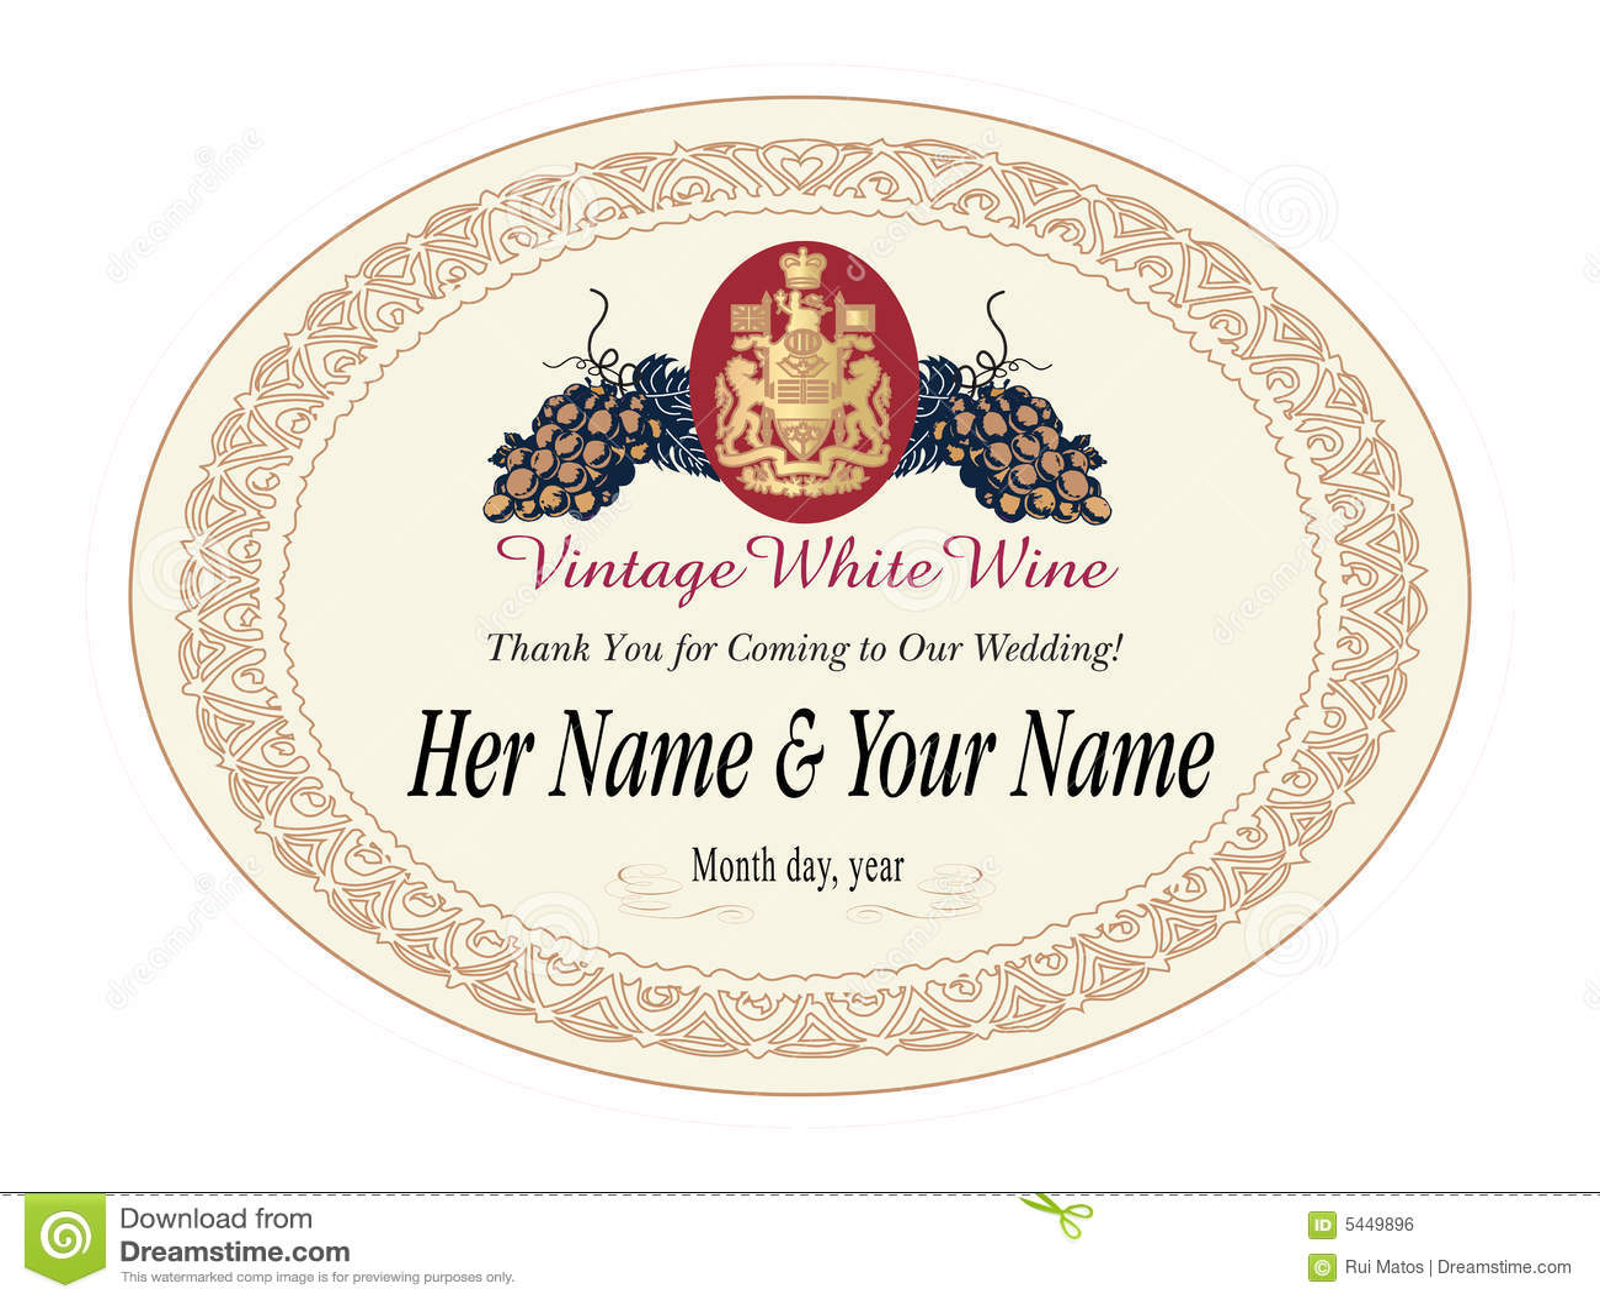 Wine Label Vector Illustration Royalty Free Stock Image - Image ...